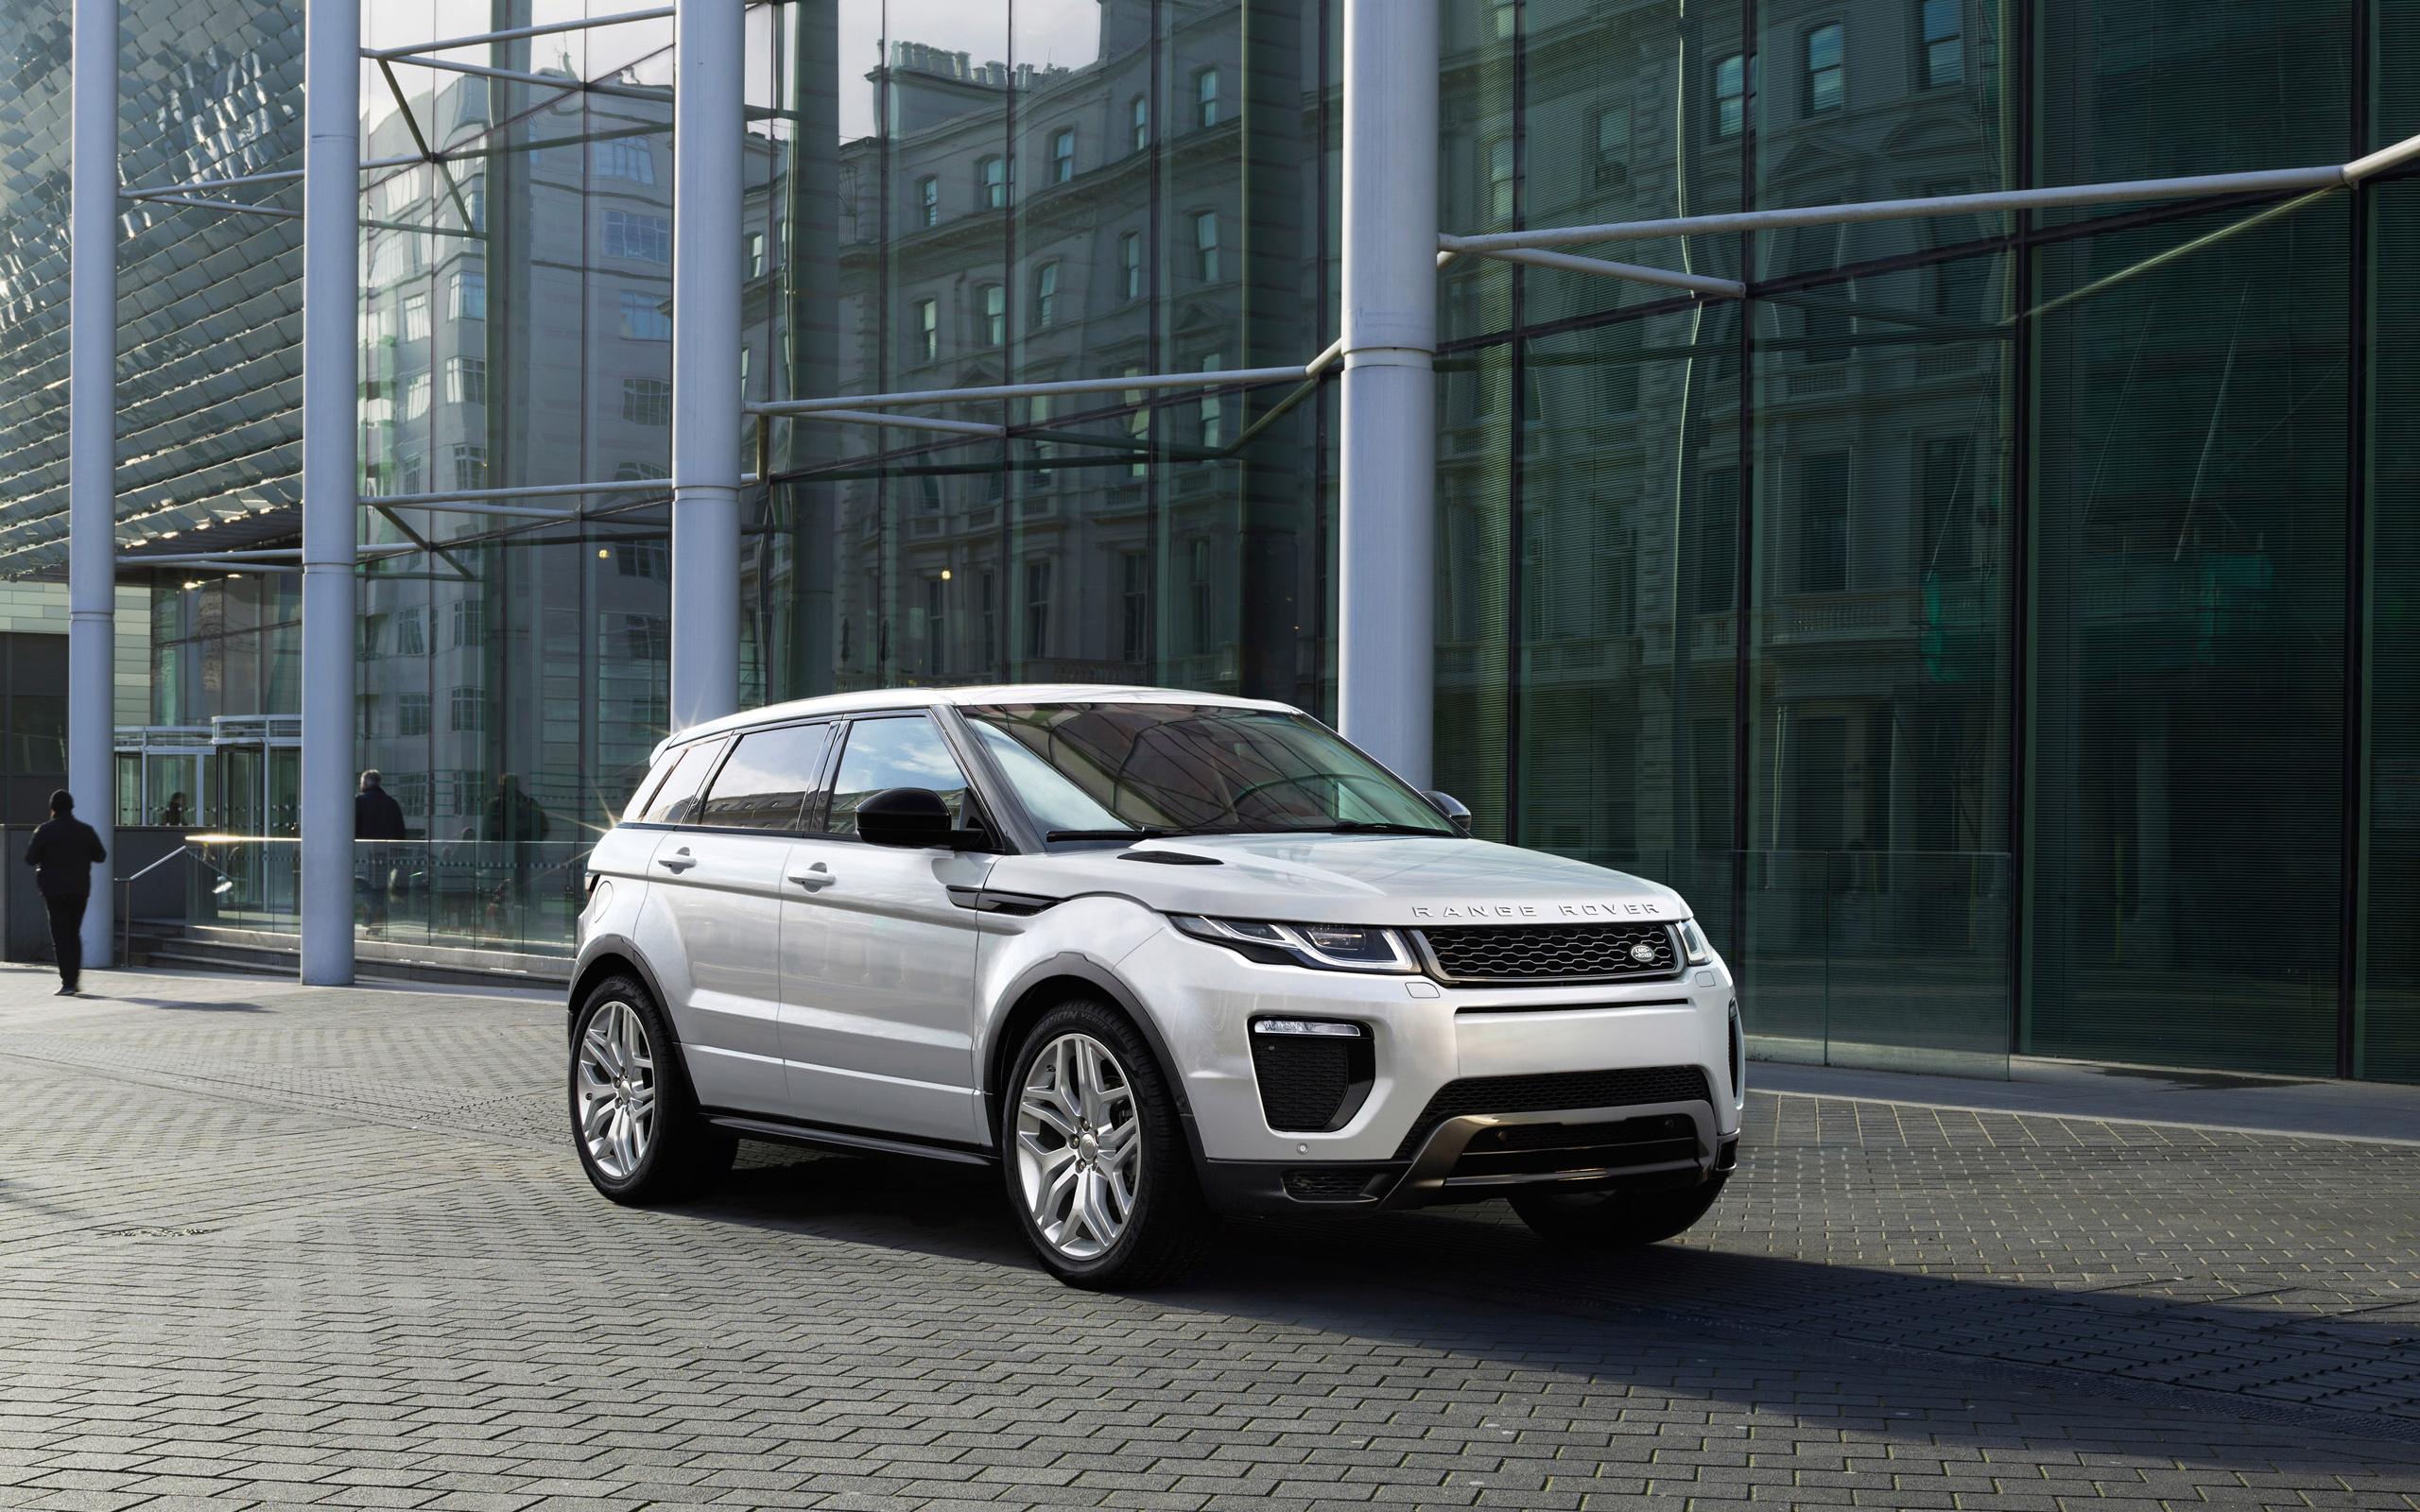 2016 Range Rover Evoque Wallpaper